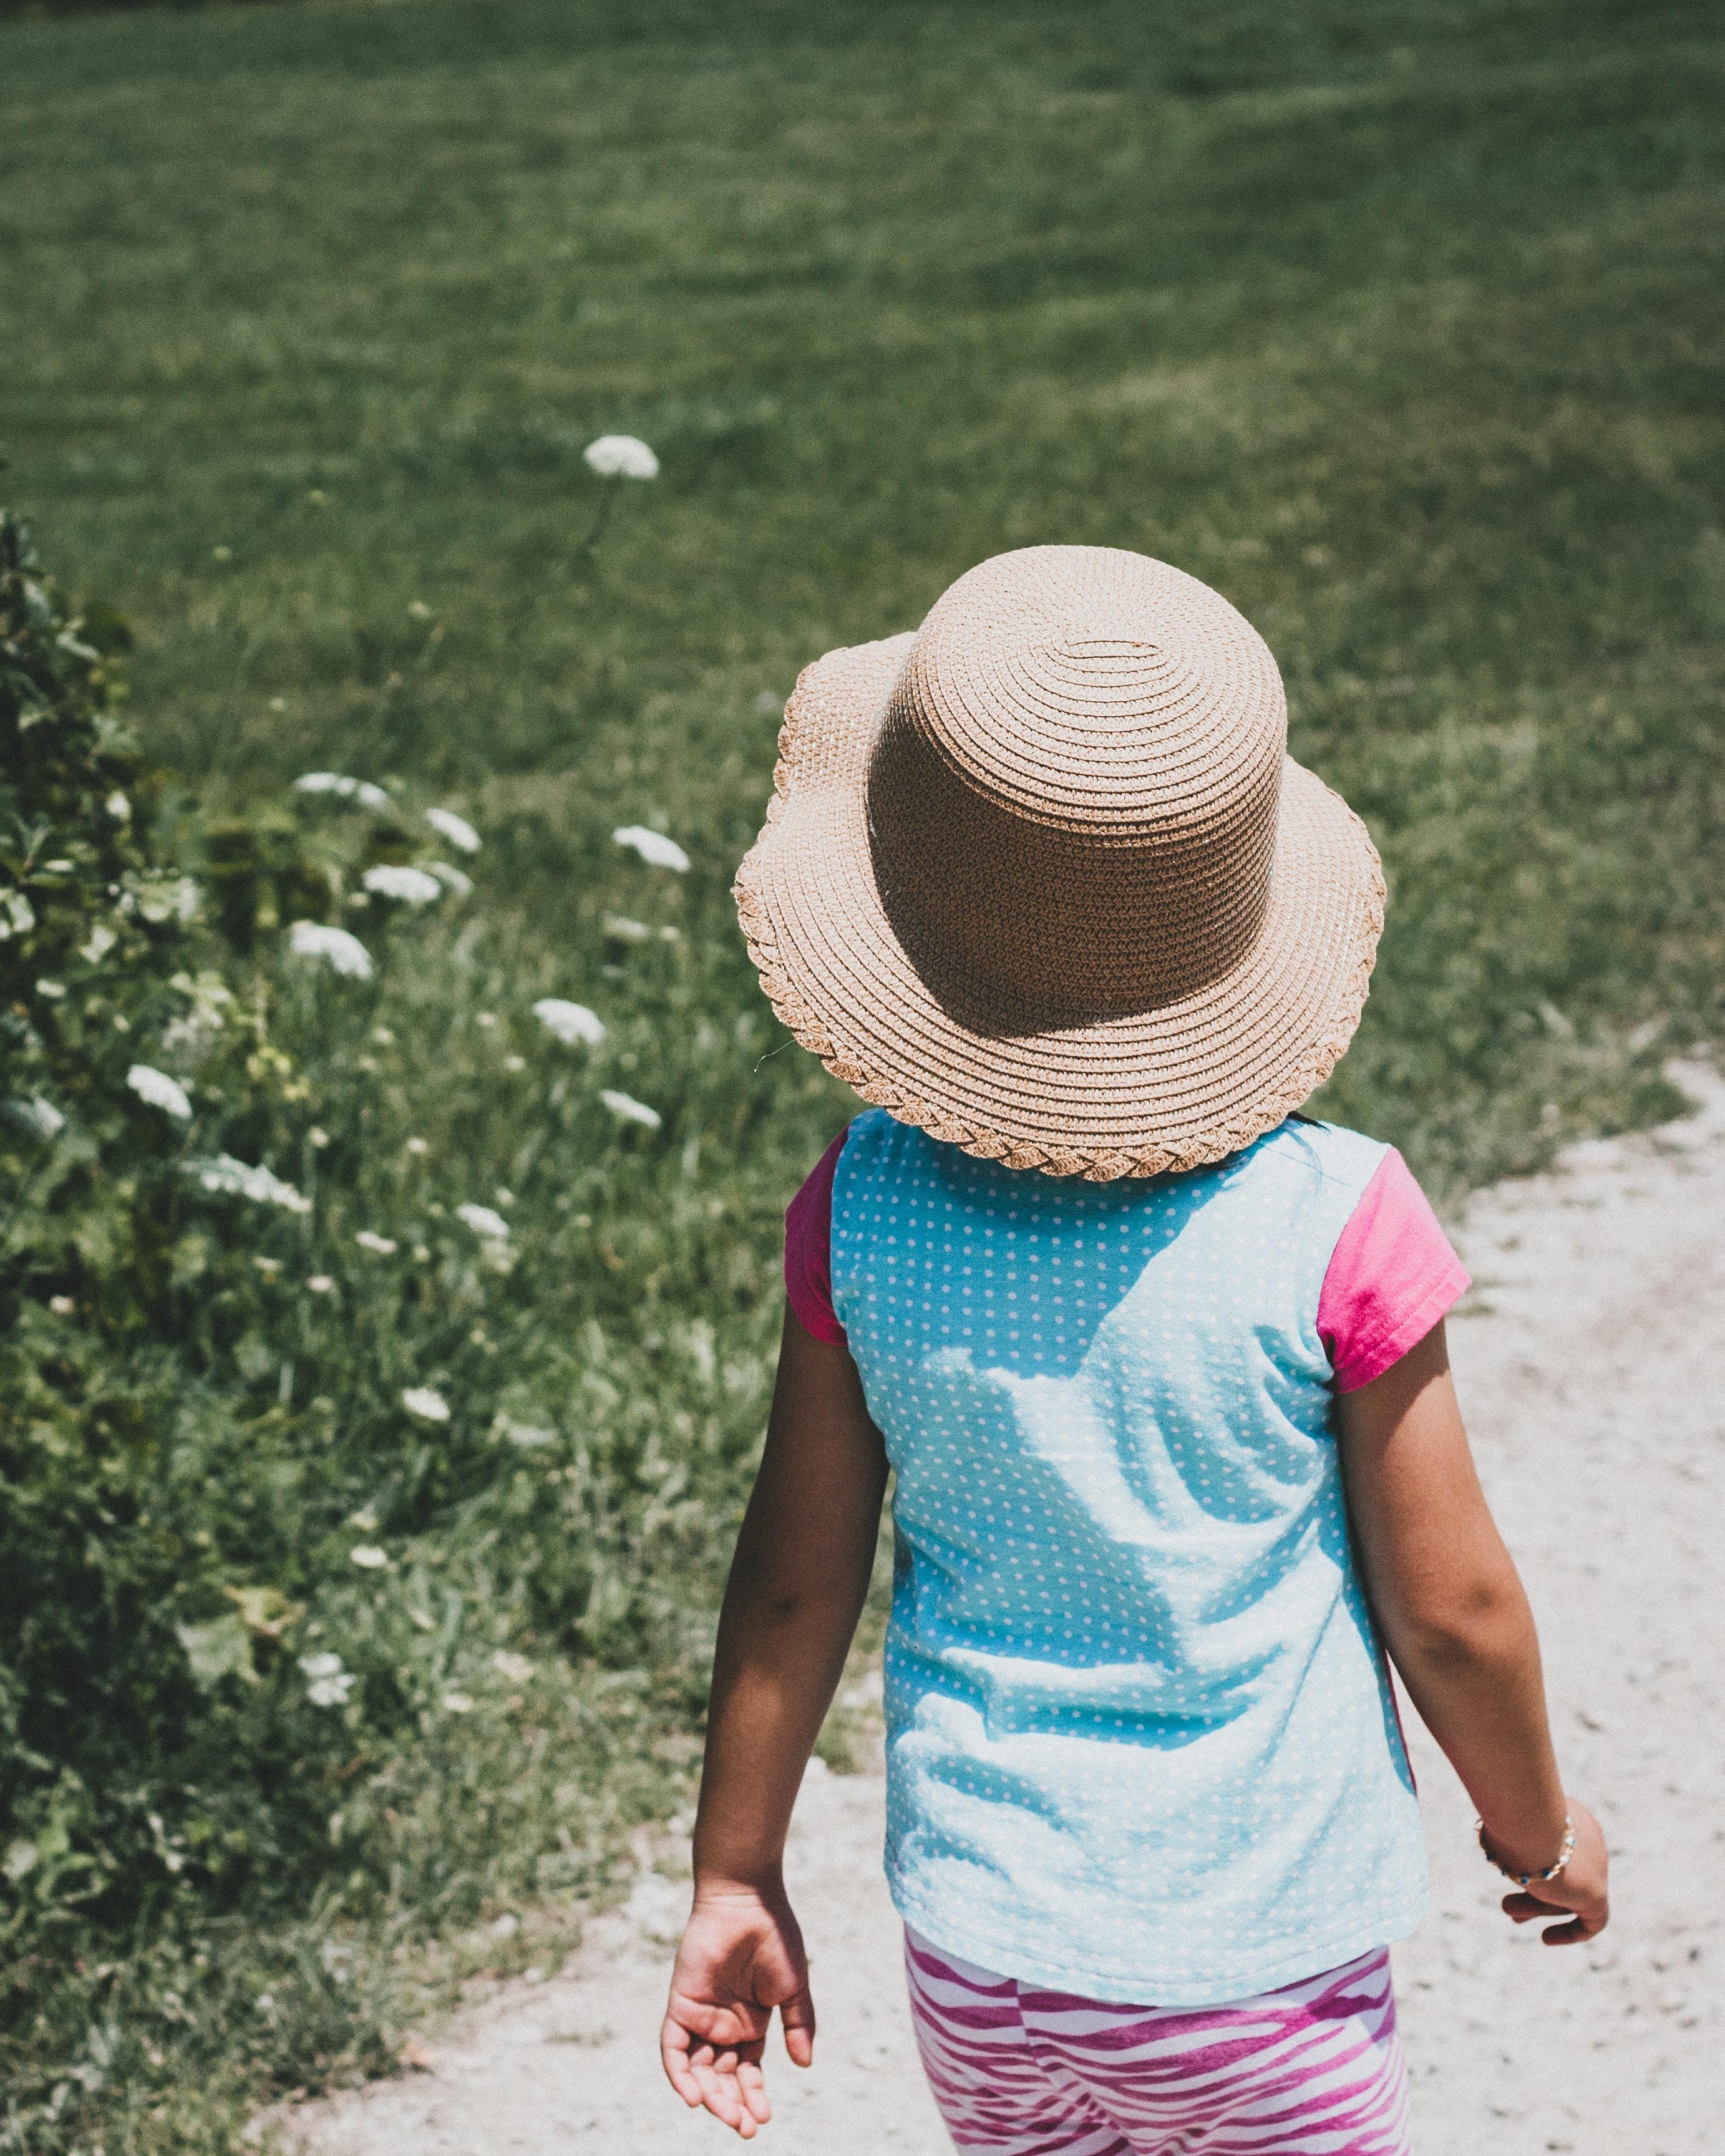 girl walking near green grass field